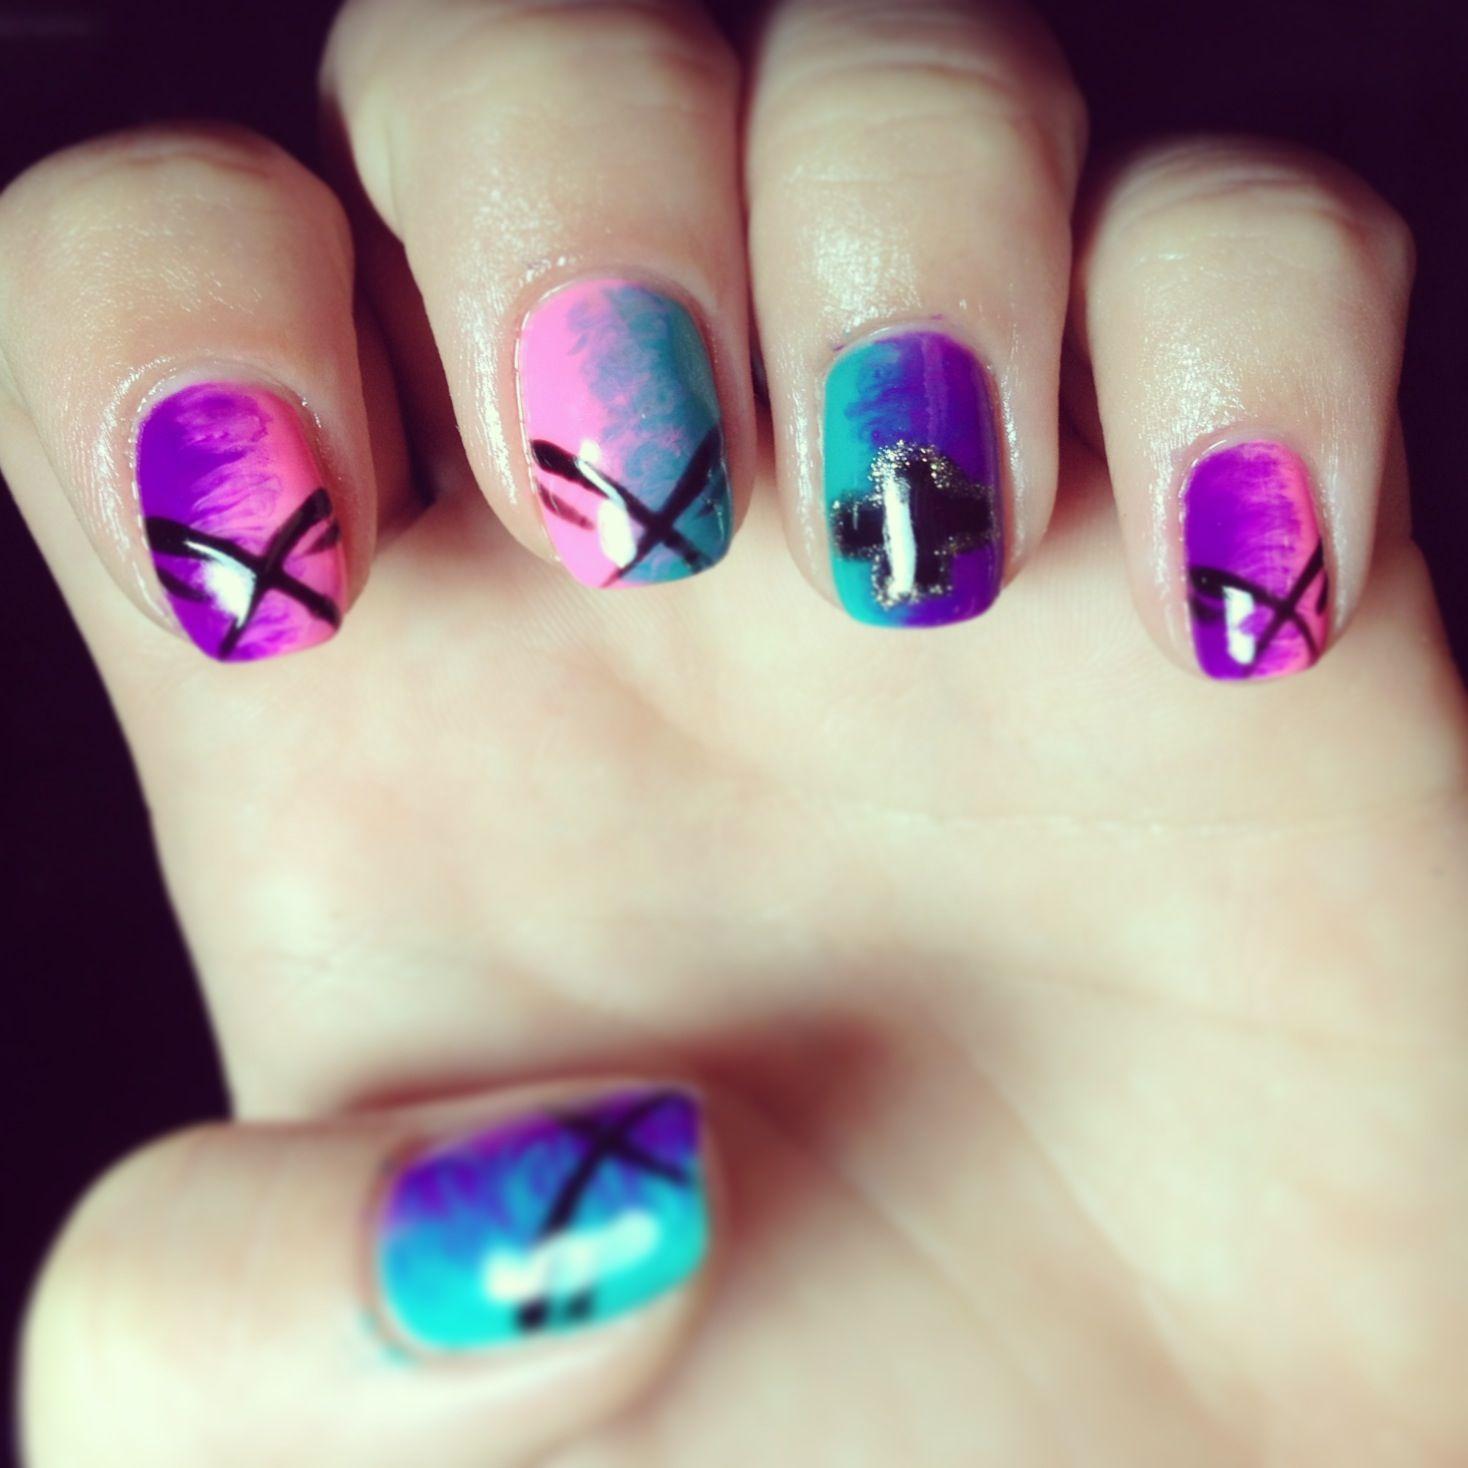 Nails nail art polish design gelish shellac fade ombre chevy black ...